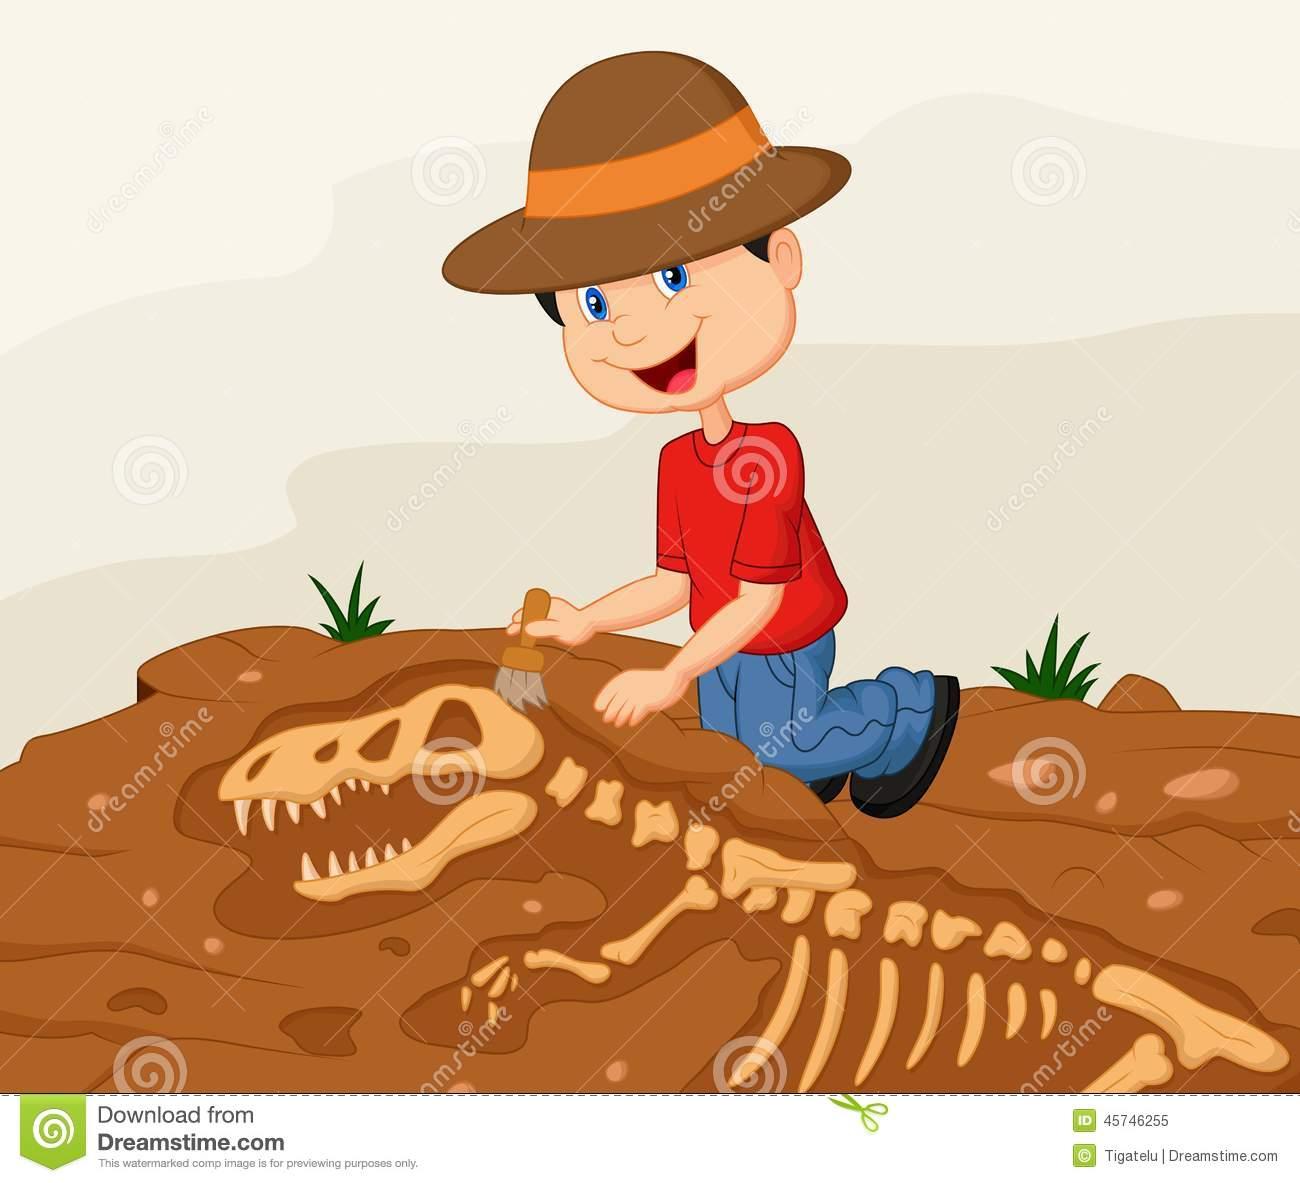 Cartoon Child Archaeologist Excavating For Dinosaur Fossil Stock.